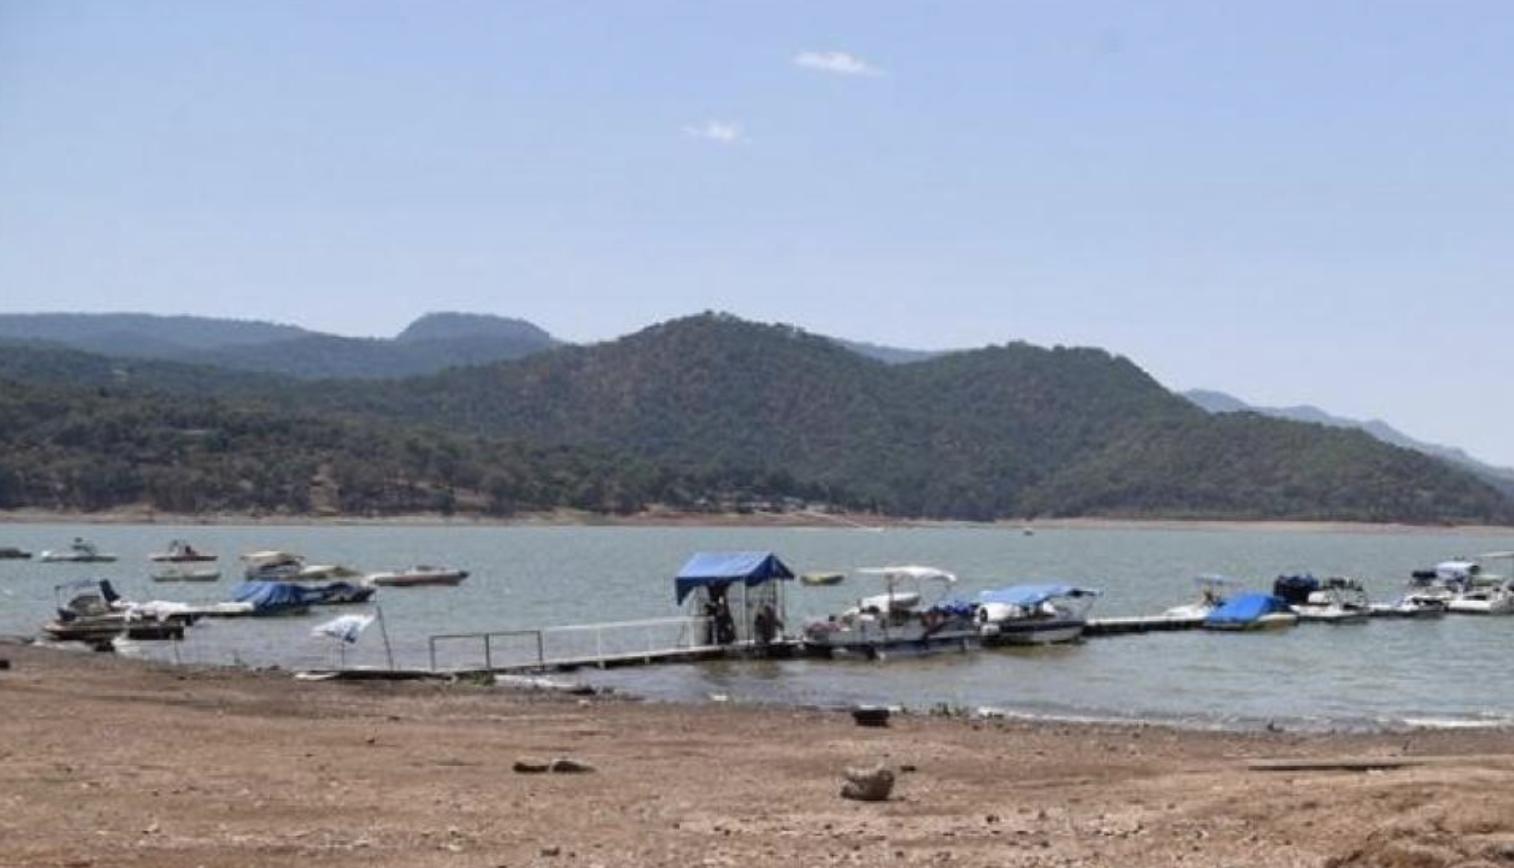 México: Lluvias aumentan ligeramente niveles del Cutzamala, está al 37.4% (ADN40)